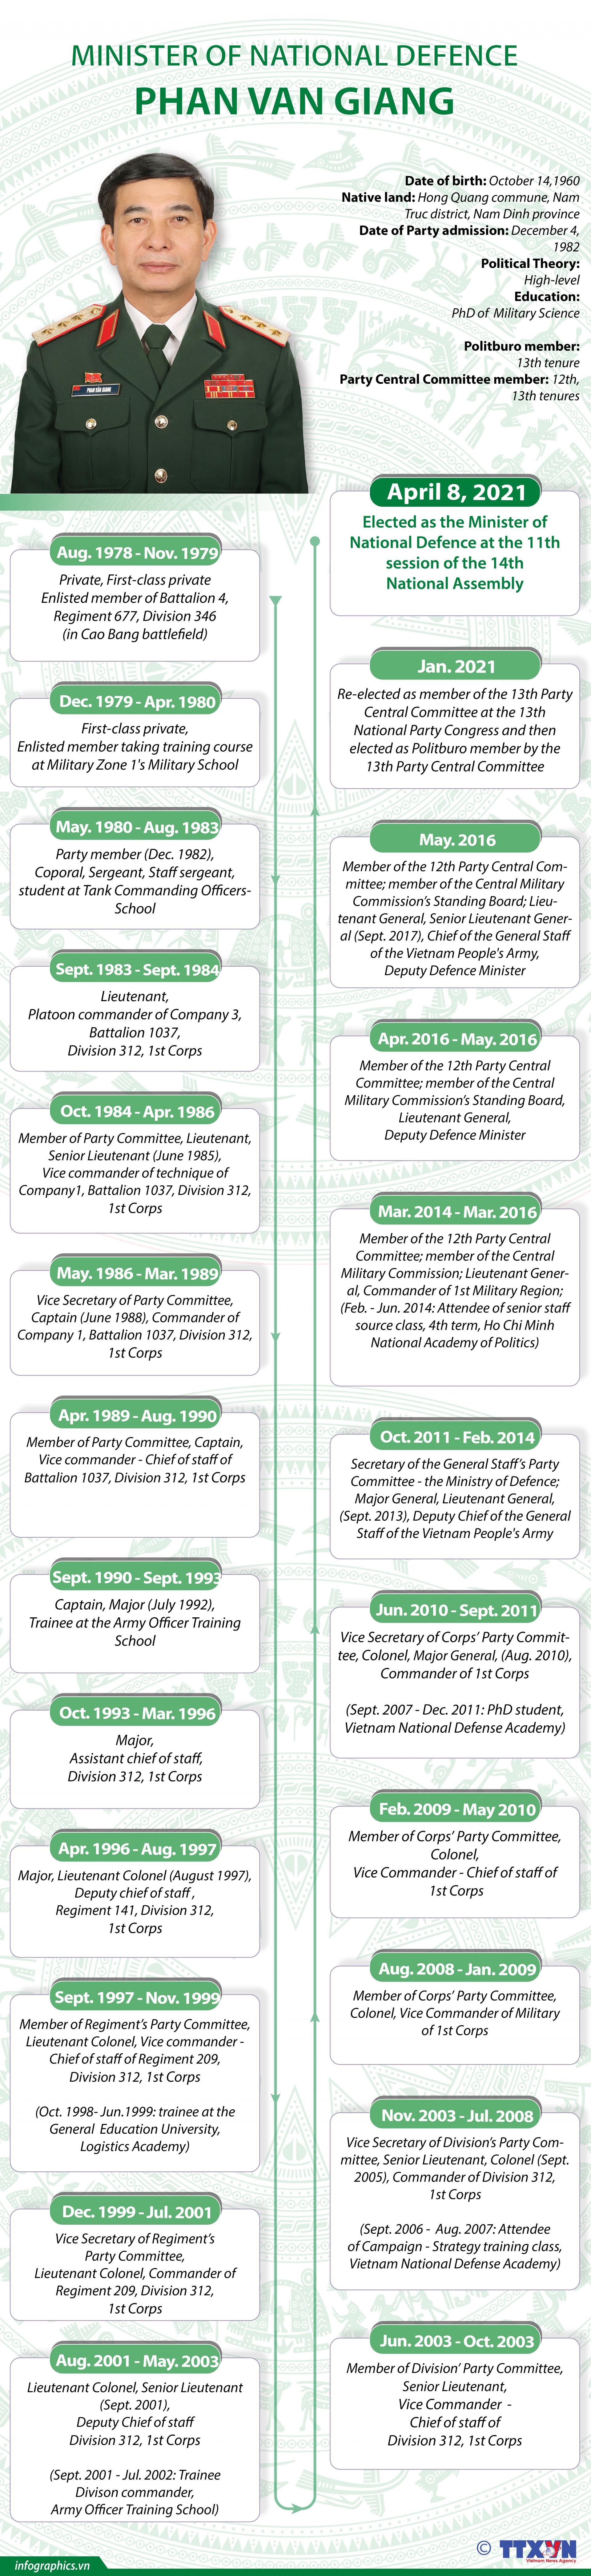 Vietnam Minister of National Defense Phan Van Giang: Biography & Career